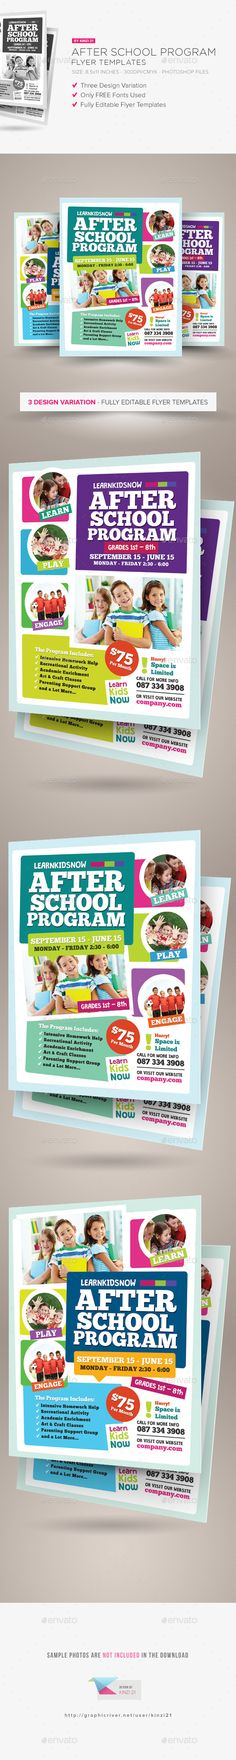 After School Program Flyer Template PSD #design Download: http://graphicriver.net/item/after-school-program-flyer-templates/14518919?ref=ksioks